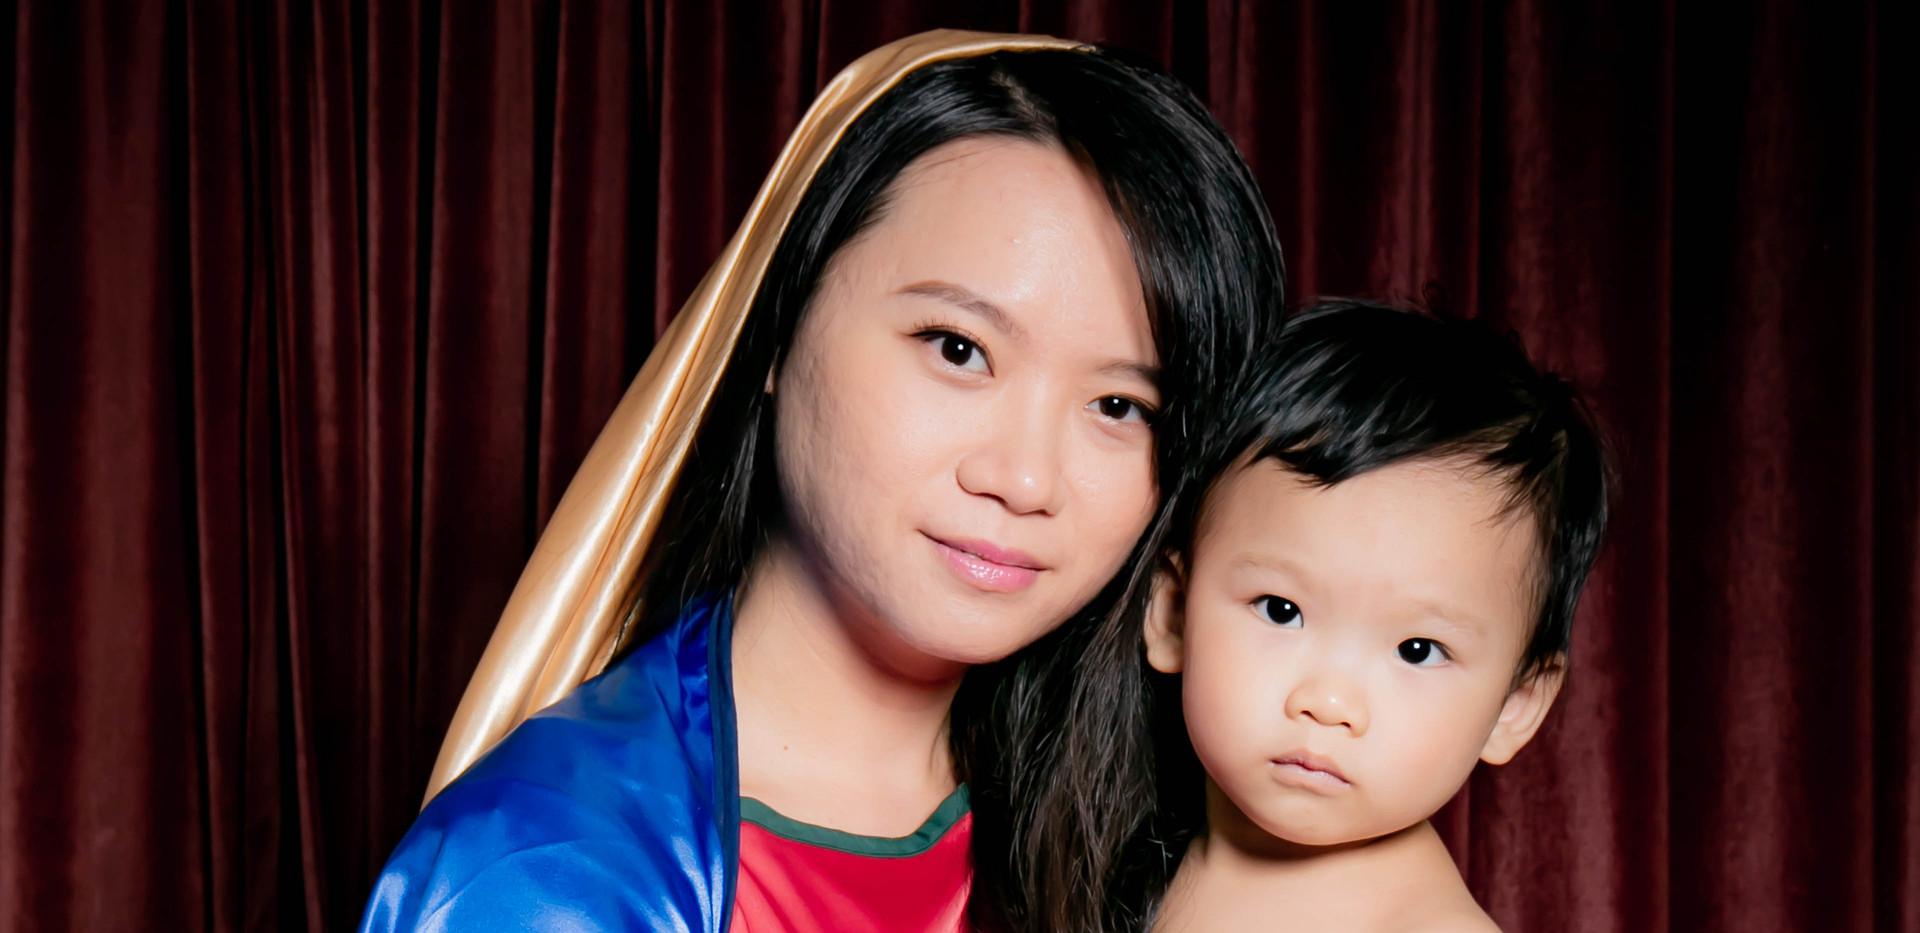 yichiao 21 century madonna and child 5.j